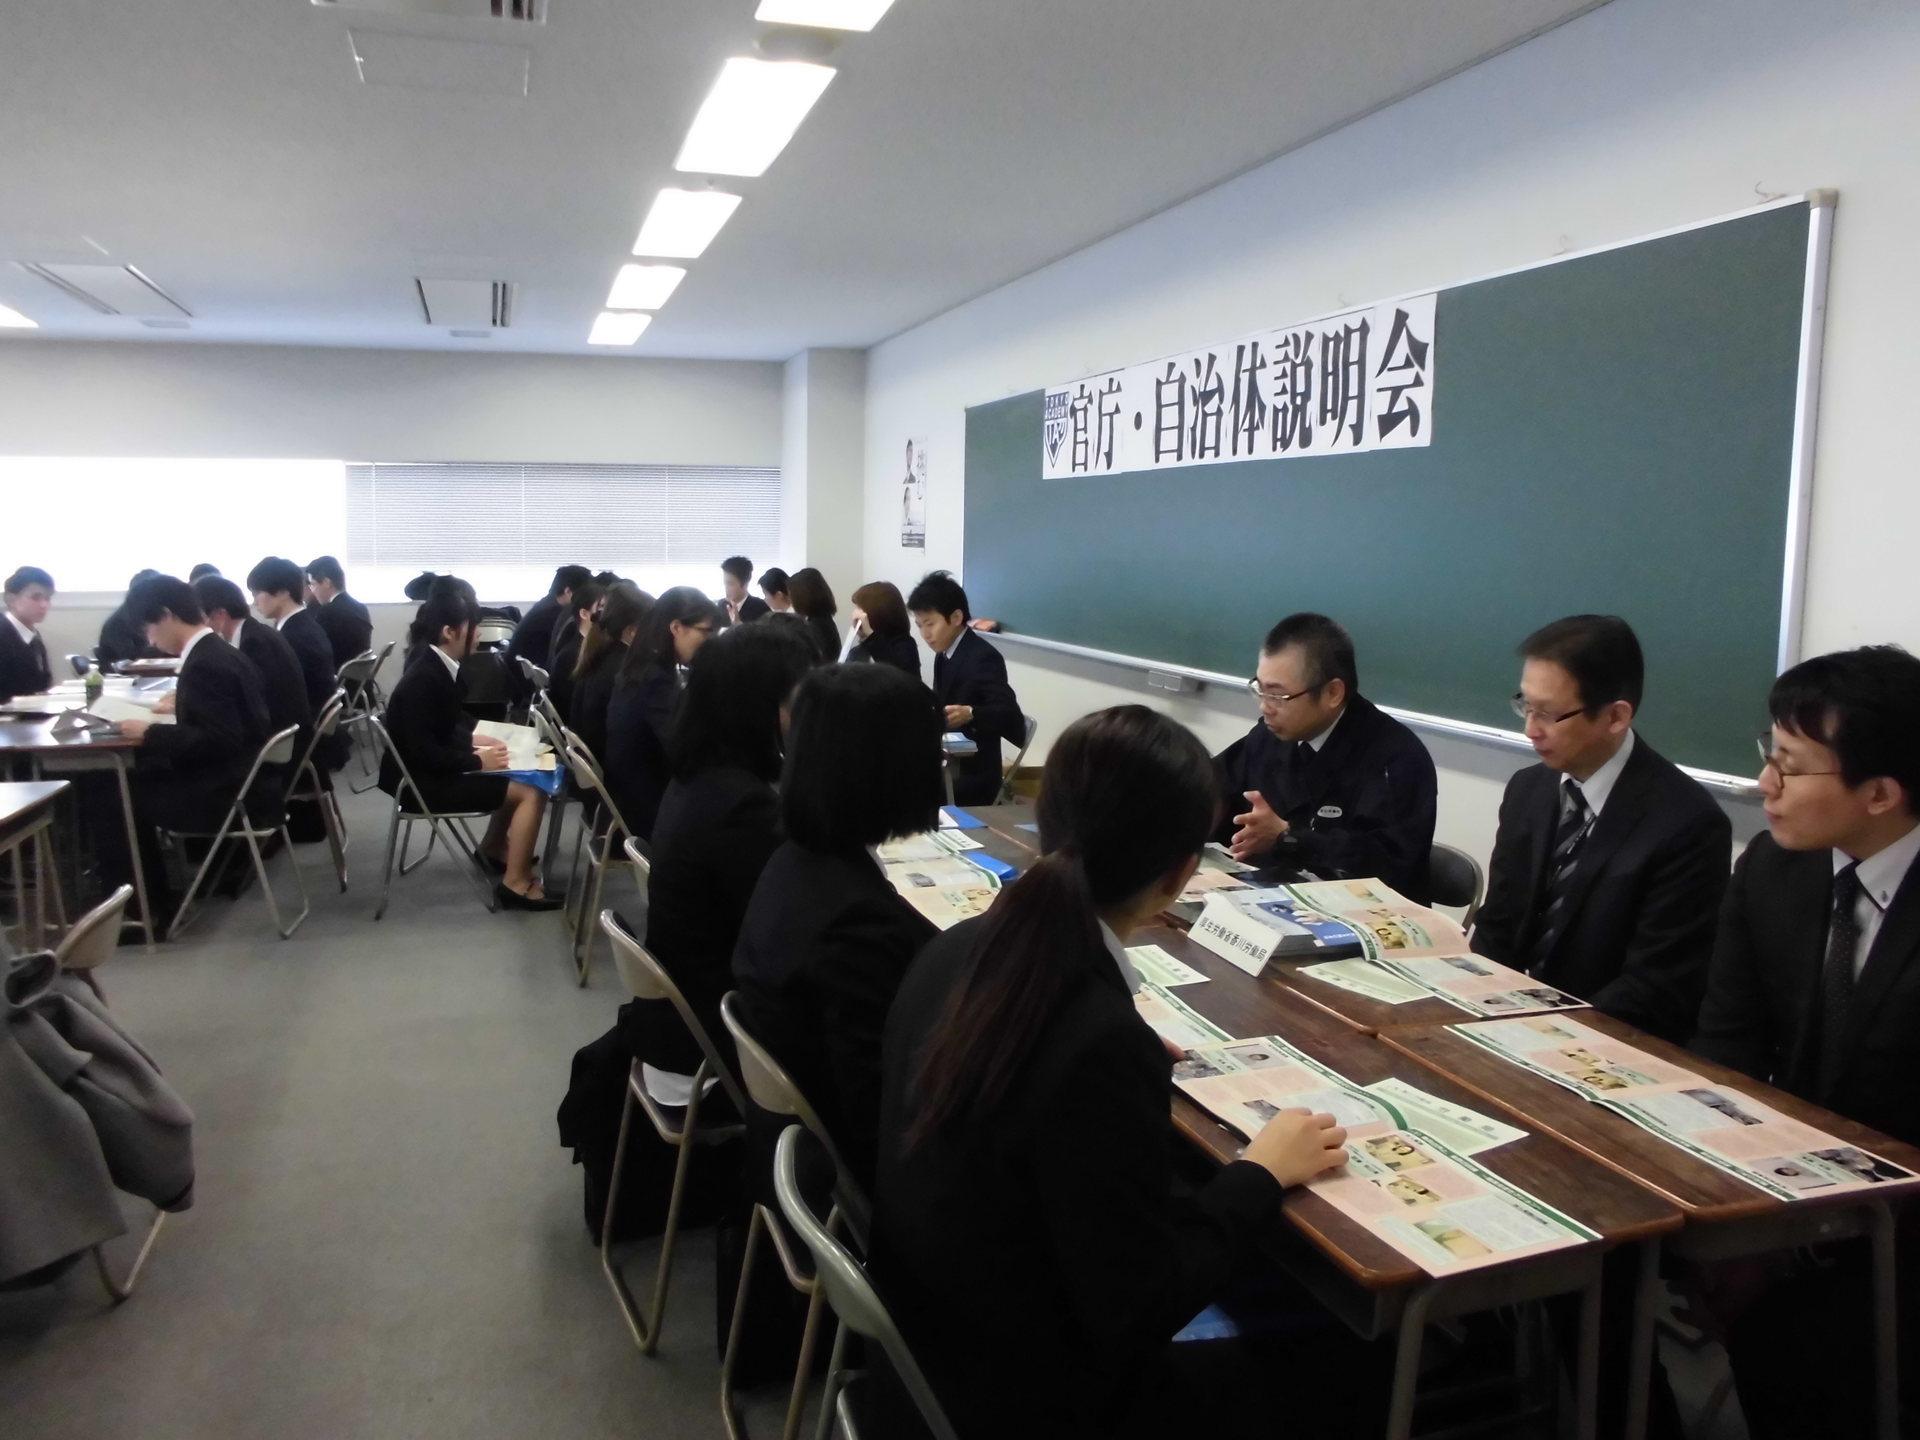 東京アカデミー高松校(教員採用試験・看護師国家試験・公務員試験)のブログ